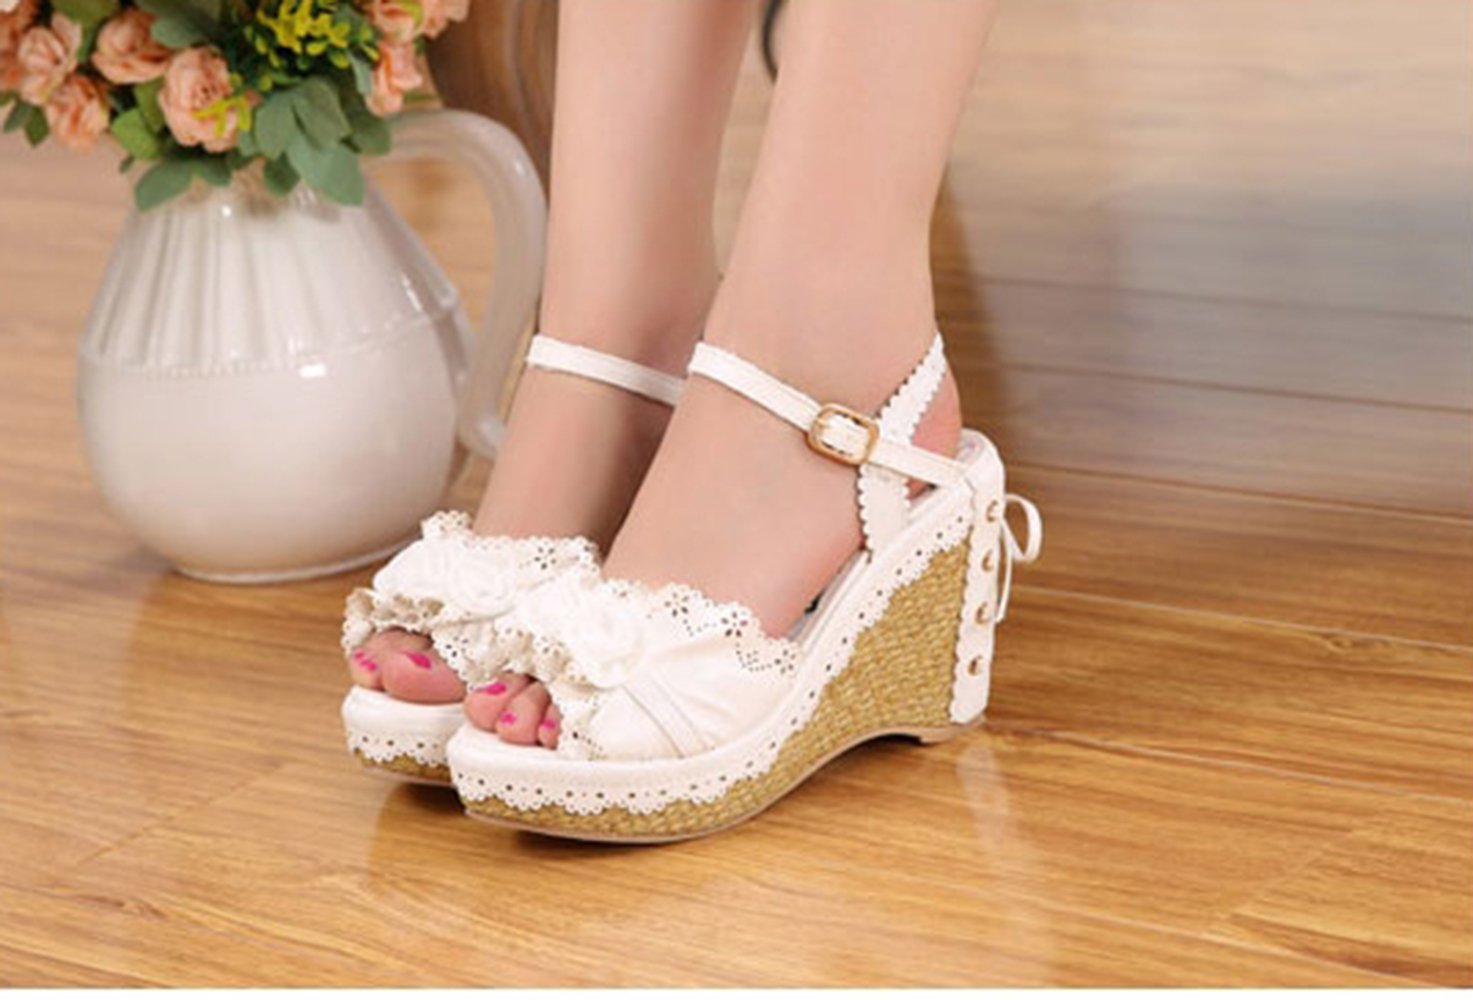 Nuoqi Womens Lolita Sweet Rose Slingback Flower Pink High Heel Slingback Rose Wedges Sandals B073B1G95N 7.5|Rose-white 745dc3